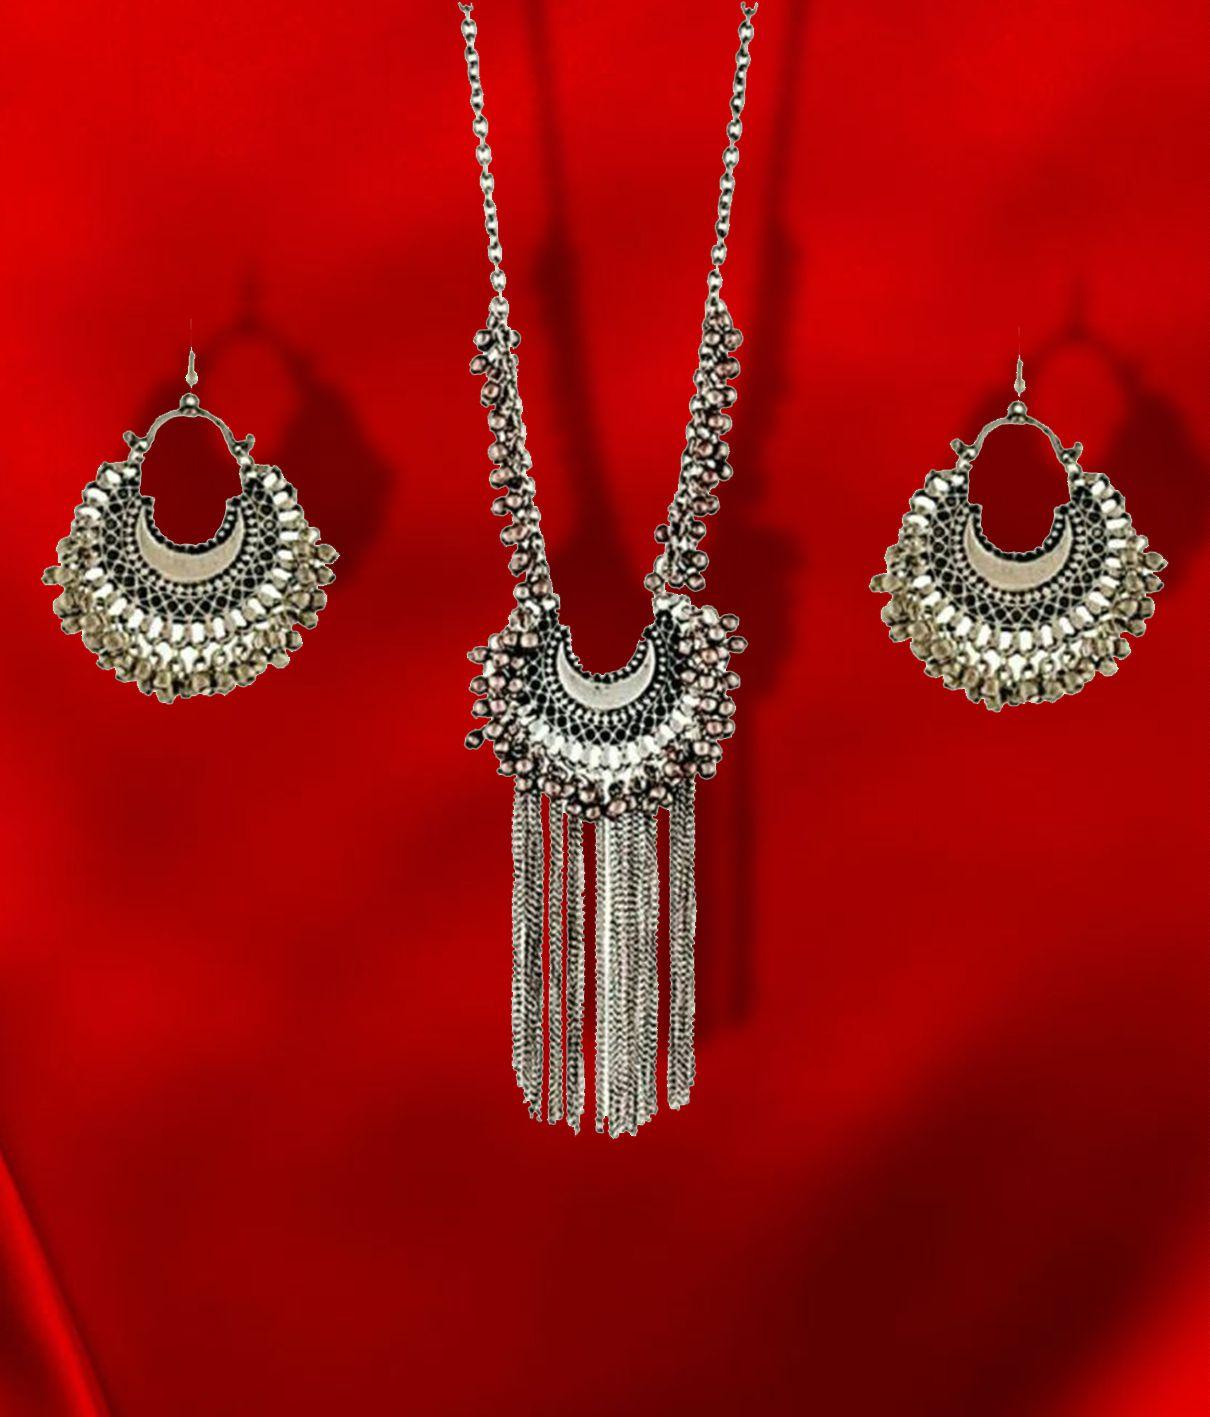 b012a519cdea3 Foxy Trend Artificial Silver Oxidised Drop Classy Luxury Afghan Tribal  Afghani Long Necklace & Earrings Jewellery Set